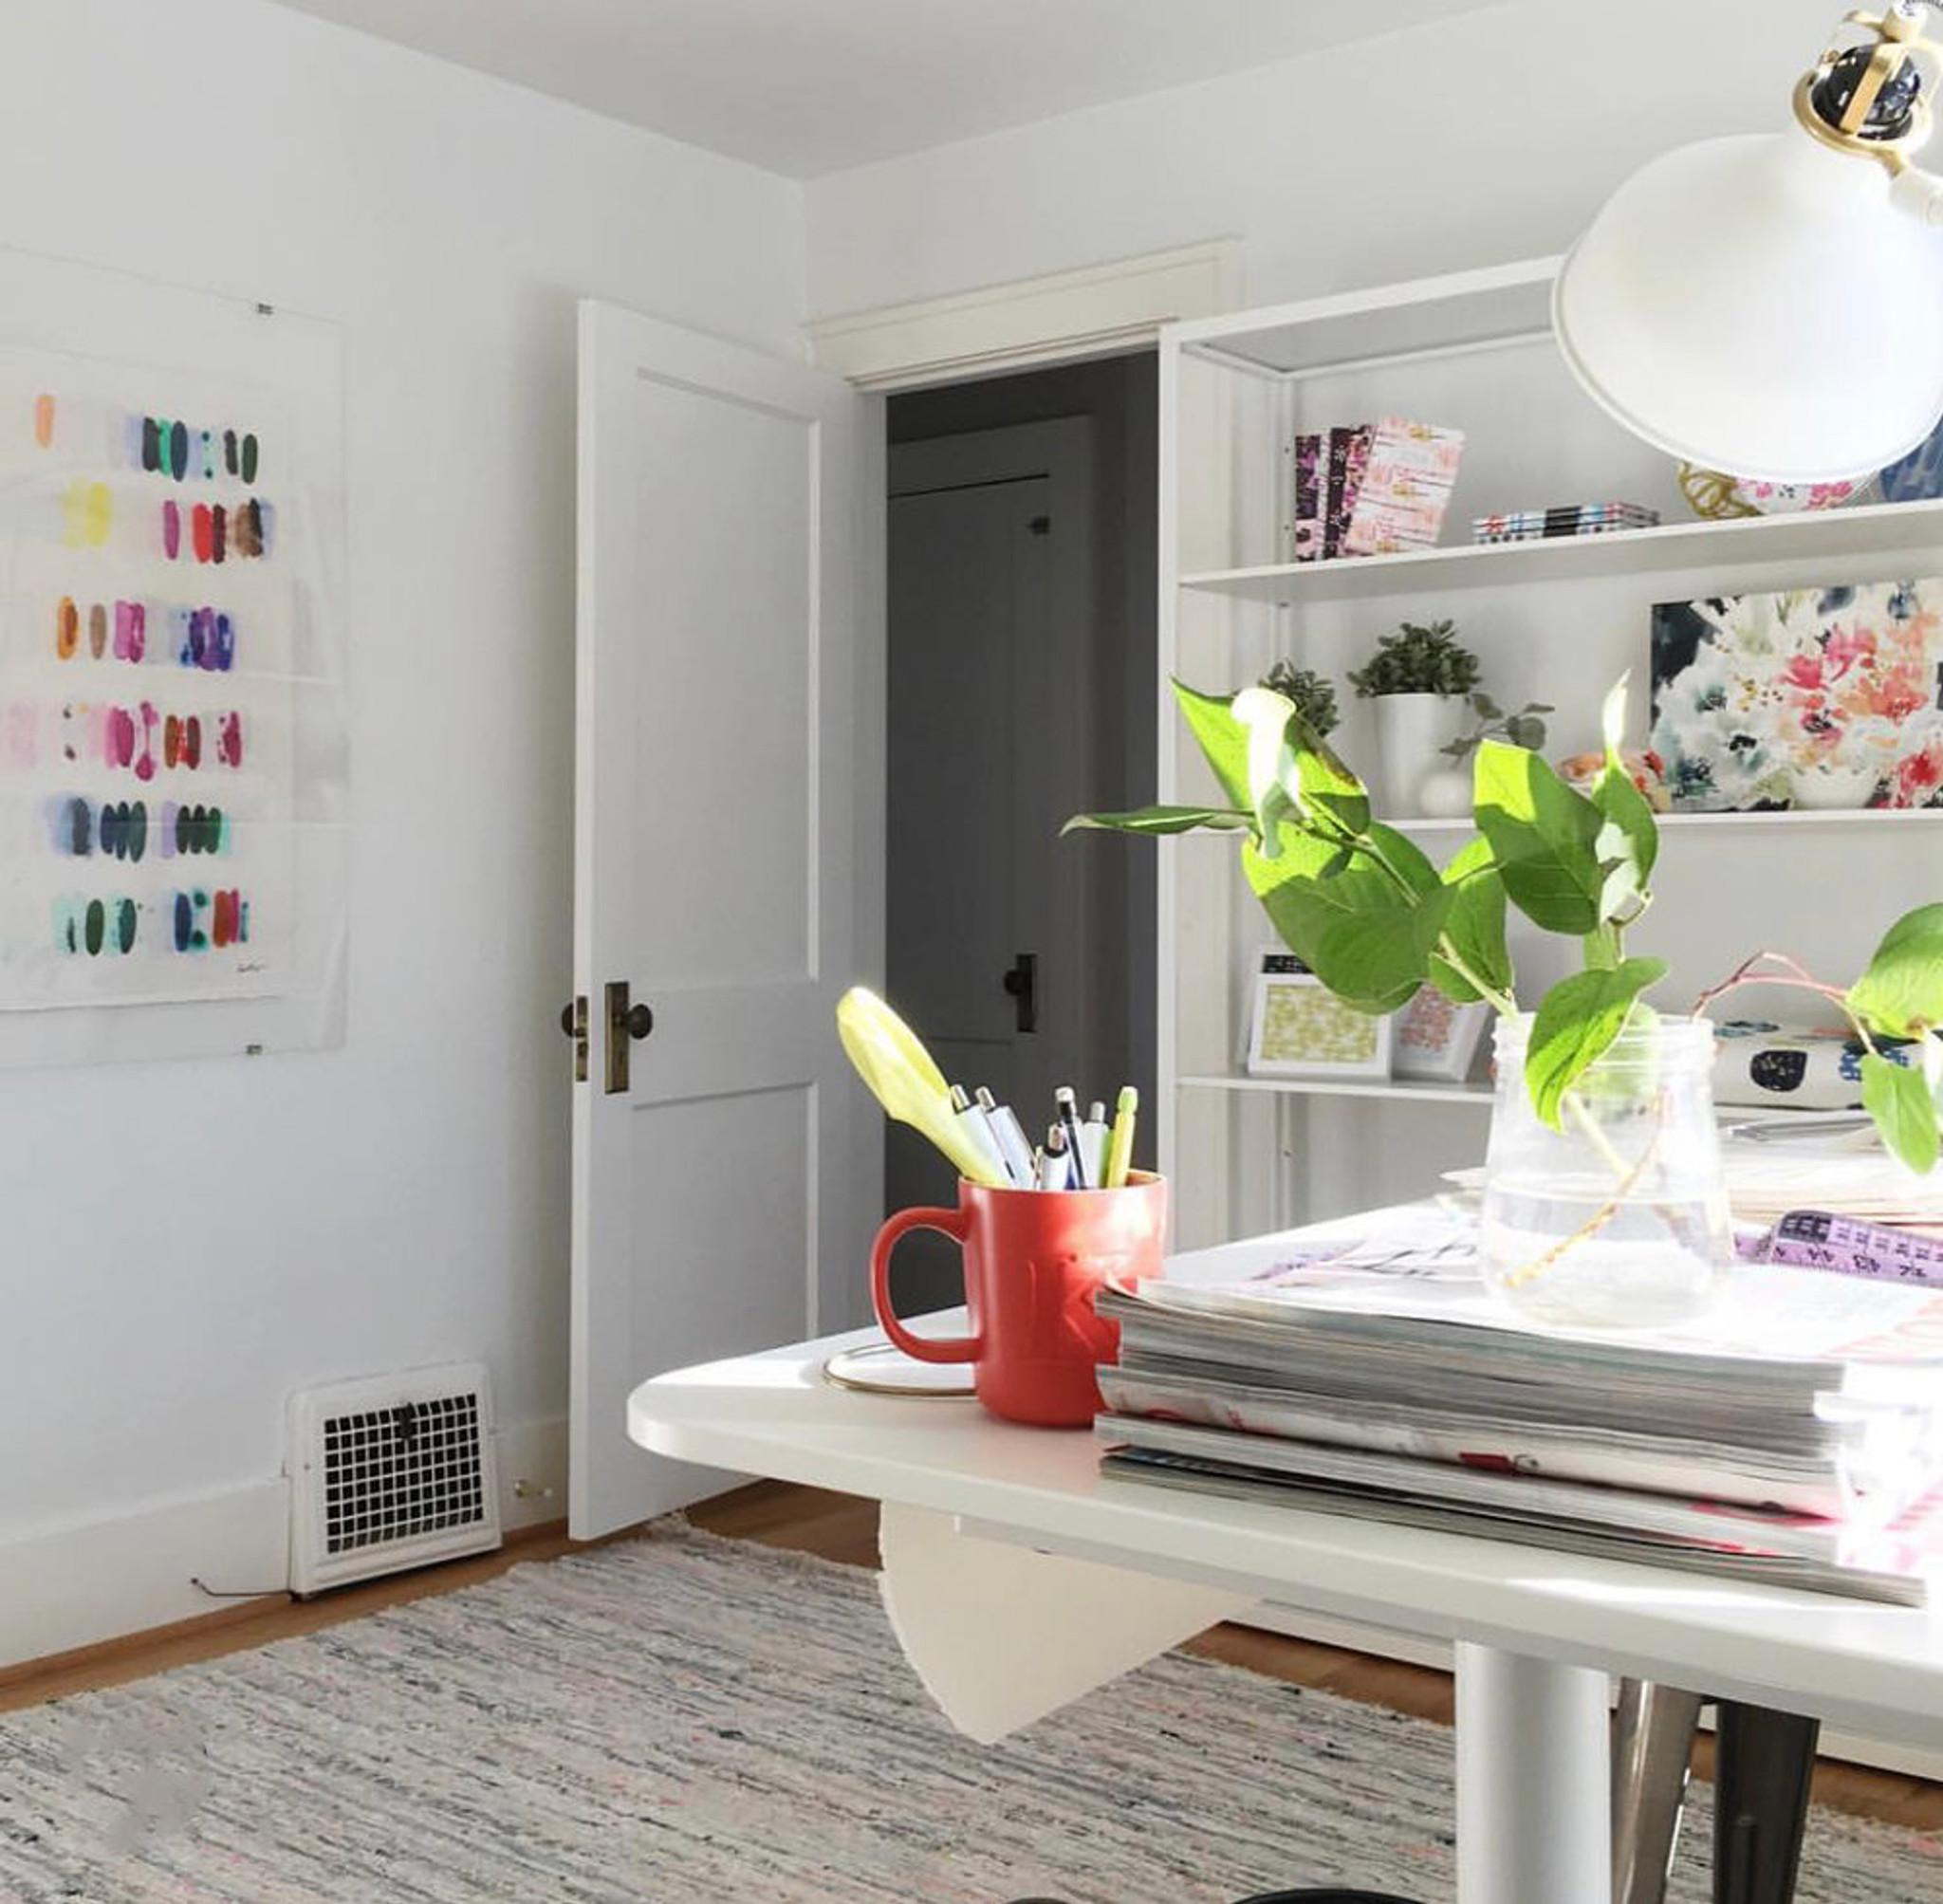 kristi kohut heavenly palette bright color modern abstract fine art print lucite shadow box frame